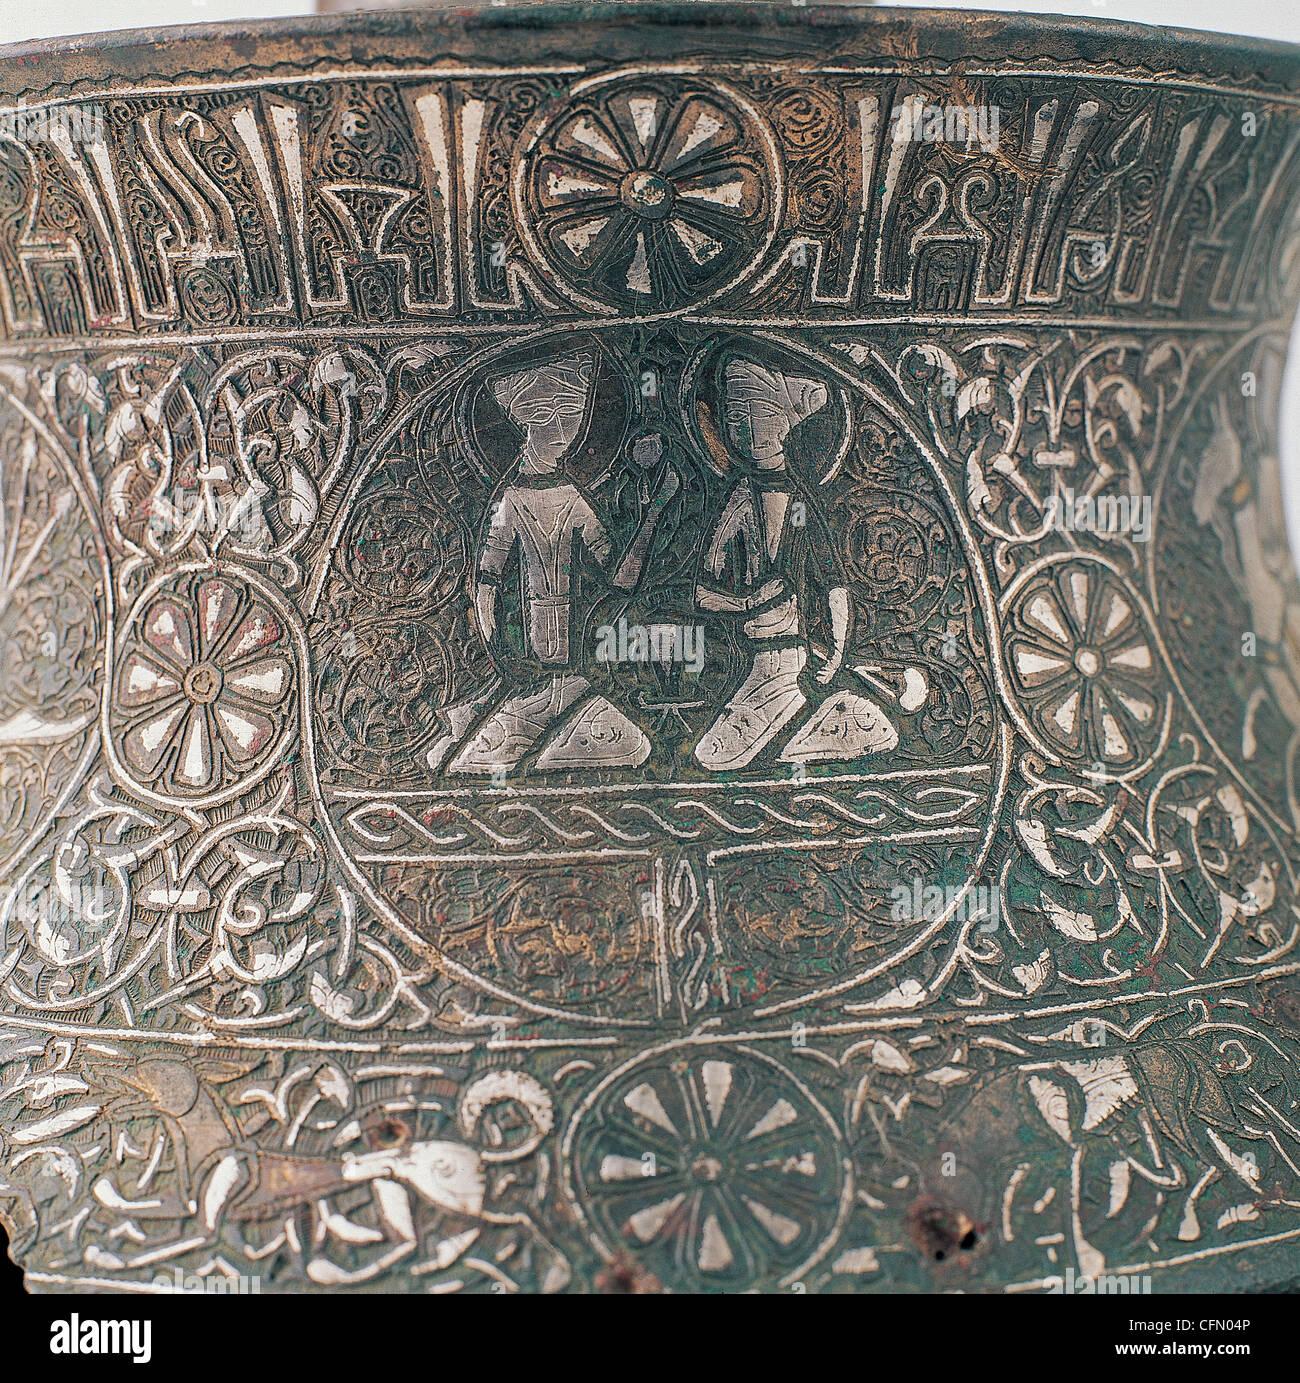 12 century Seljuk bronze chandelier - Stock Image